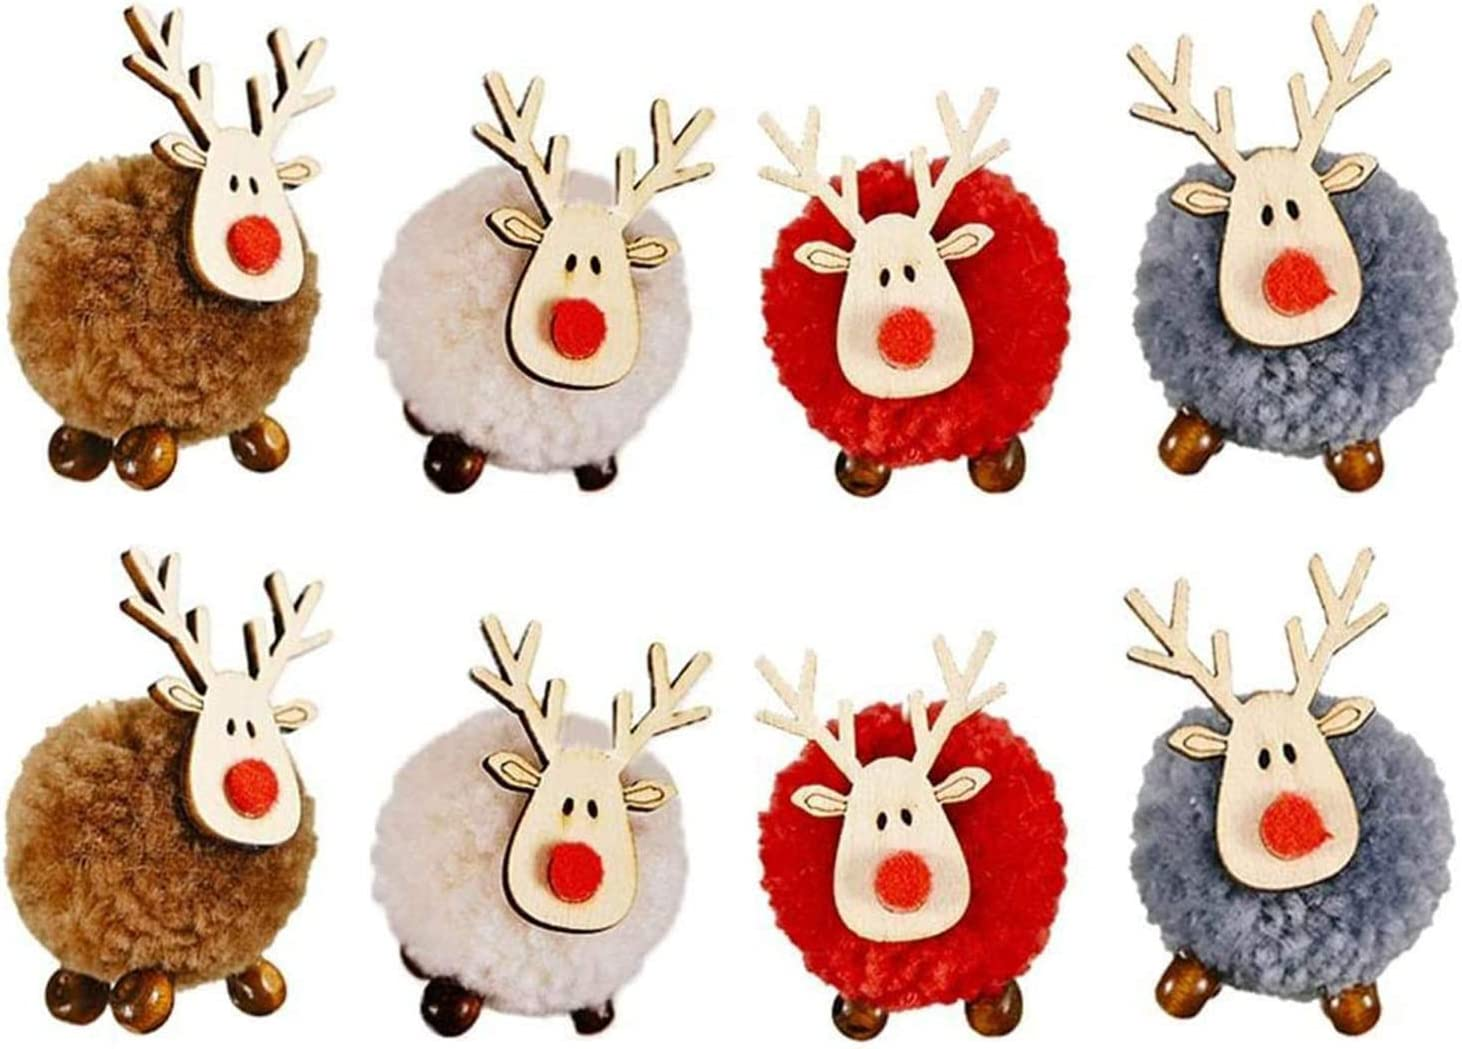 Christmas Ornaments Set, Christmas Tree Decorations, 8 Pcs Christmas Cute Wool Felt Wooden Elk Antler Pendants, Lovely Deer Craft Ornament for Xmas Tree Decor, Merry Christmas Home Decor